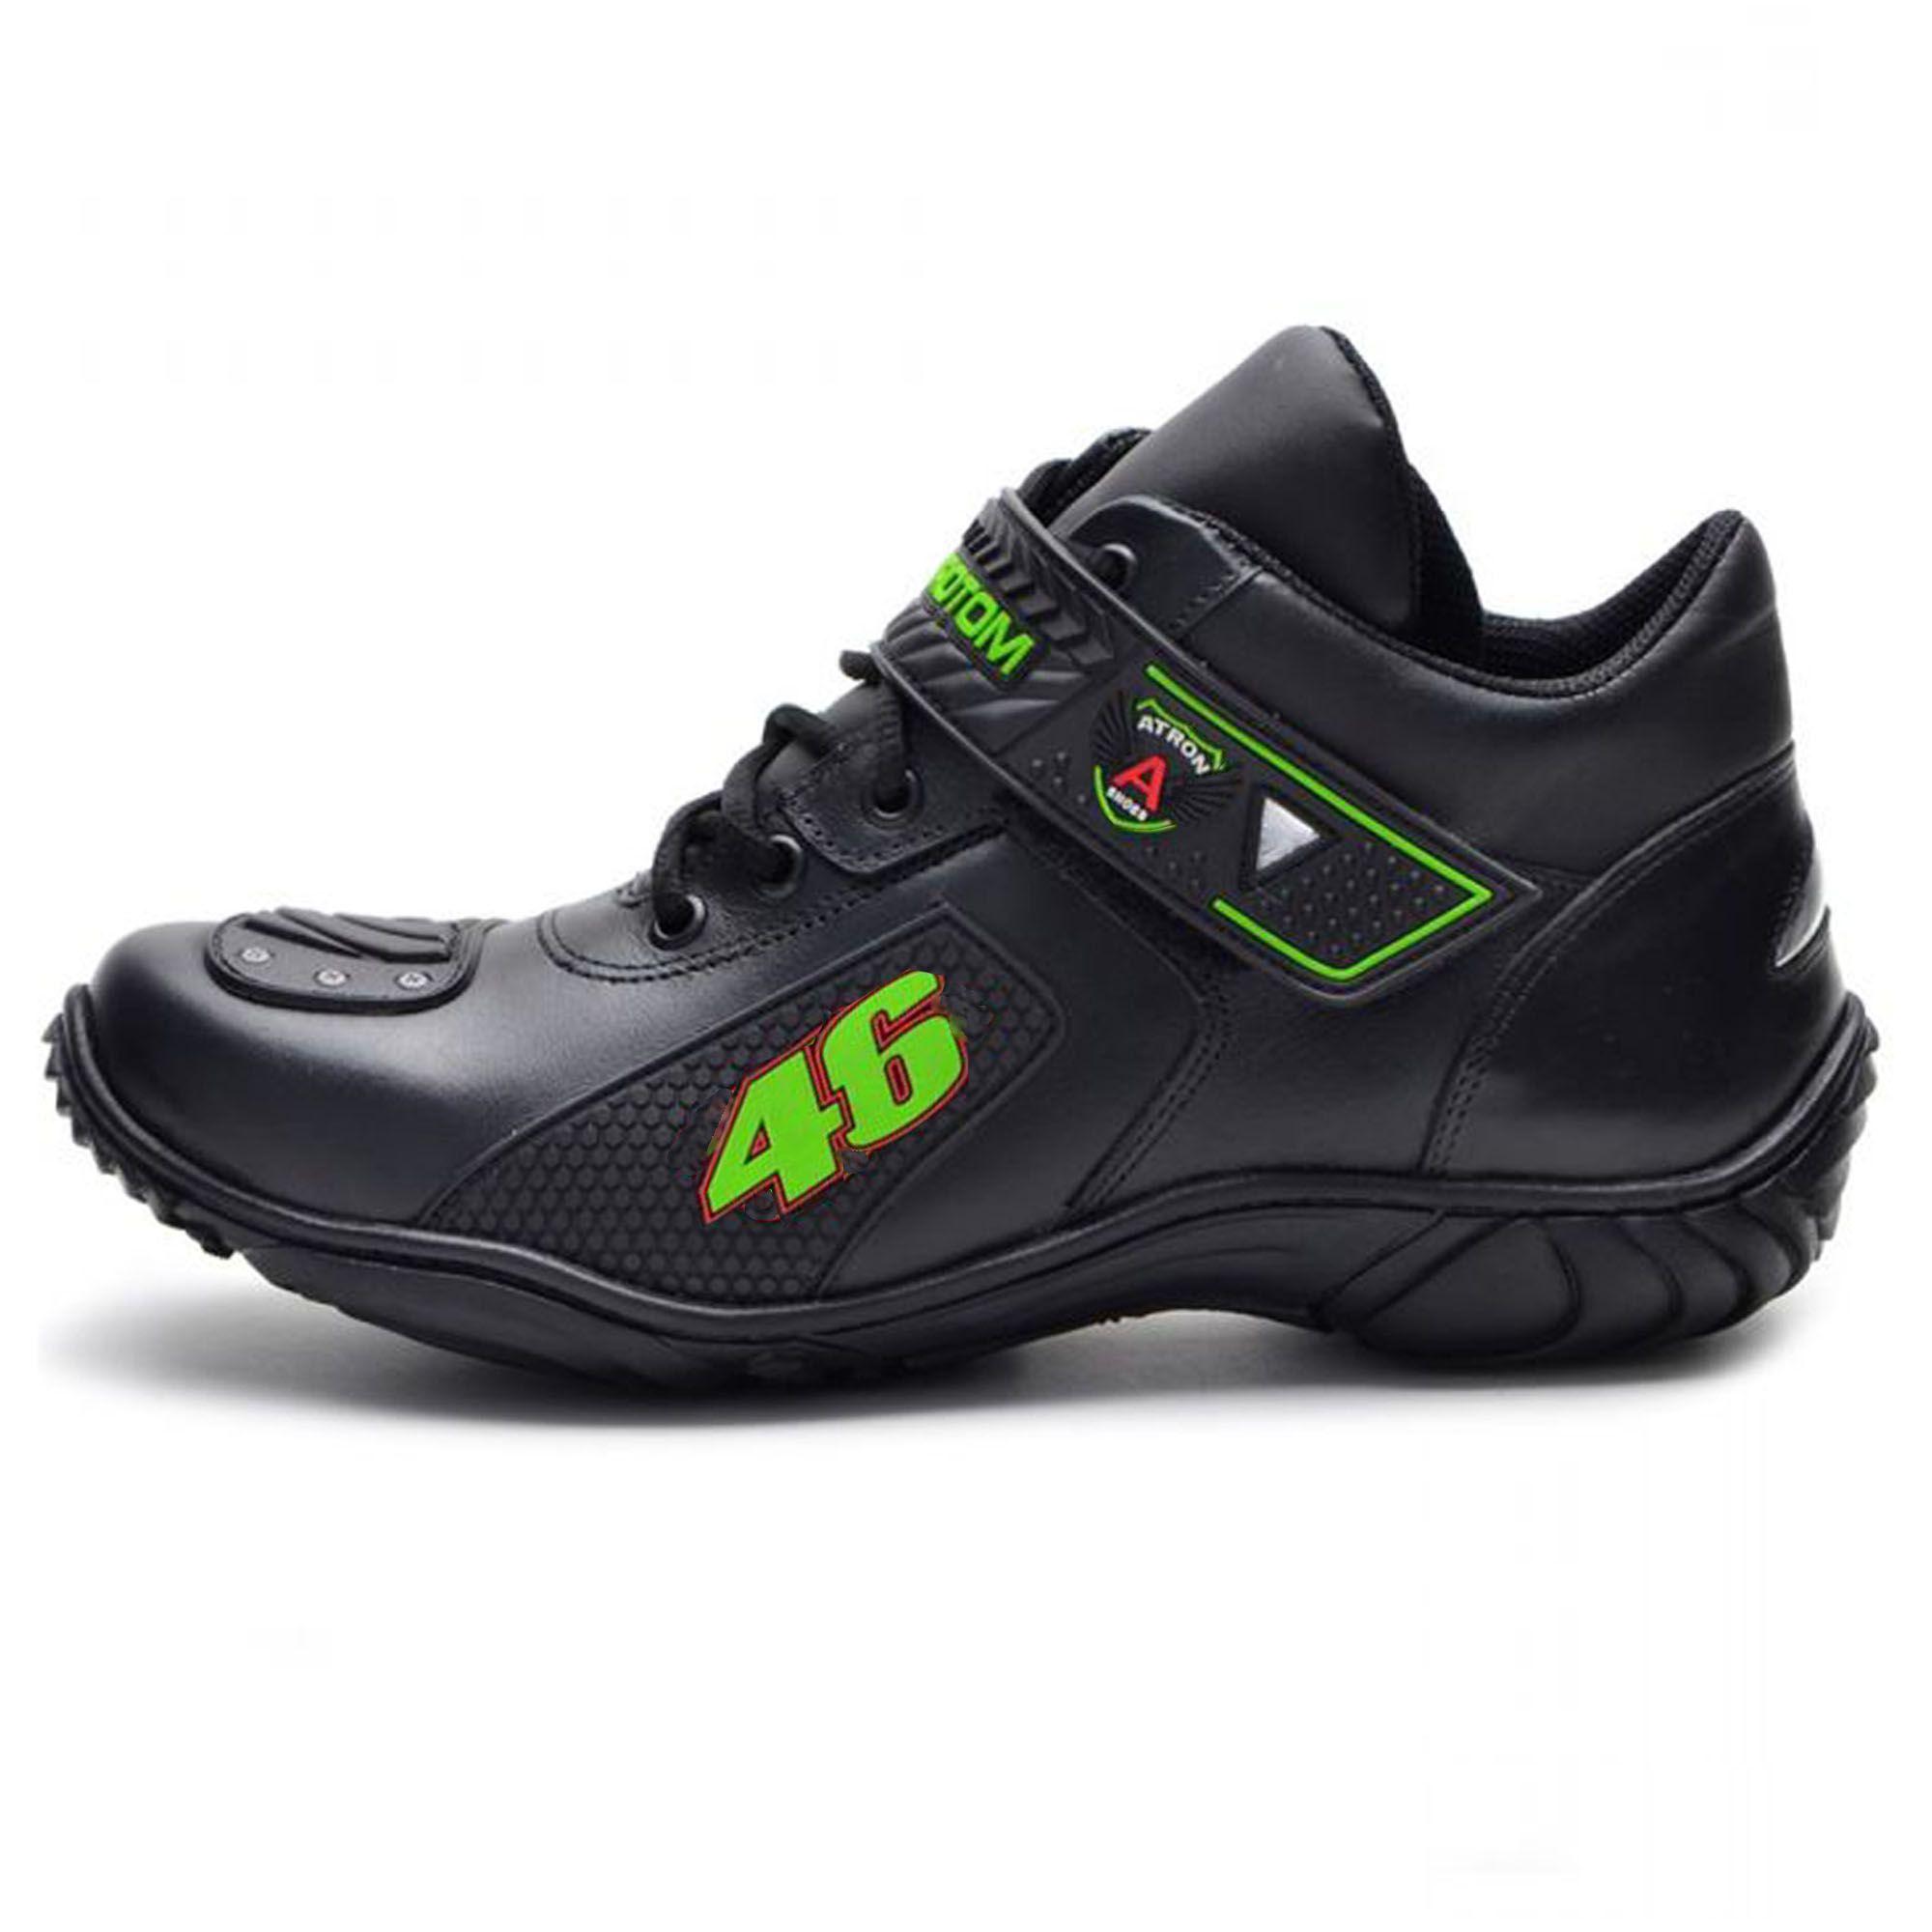 Bota Motociclista Valentino Rossi Verde 46